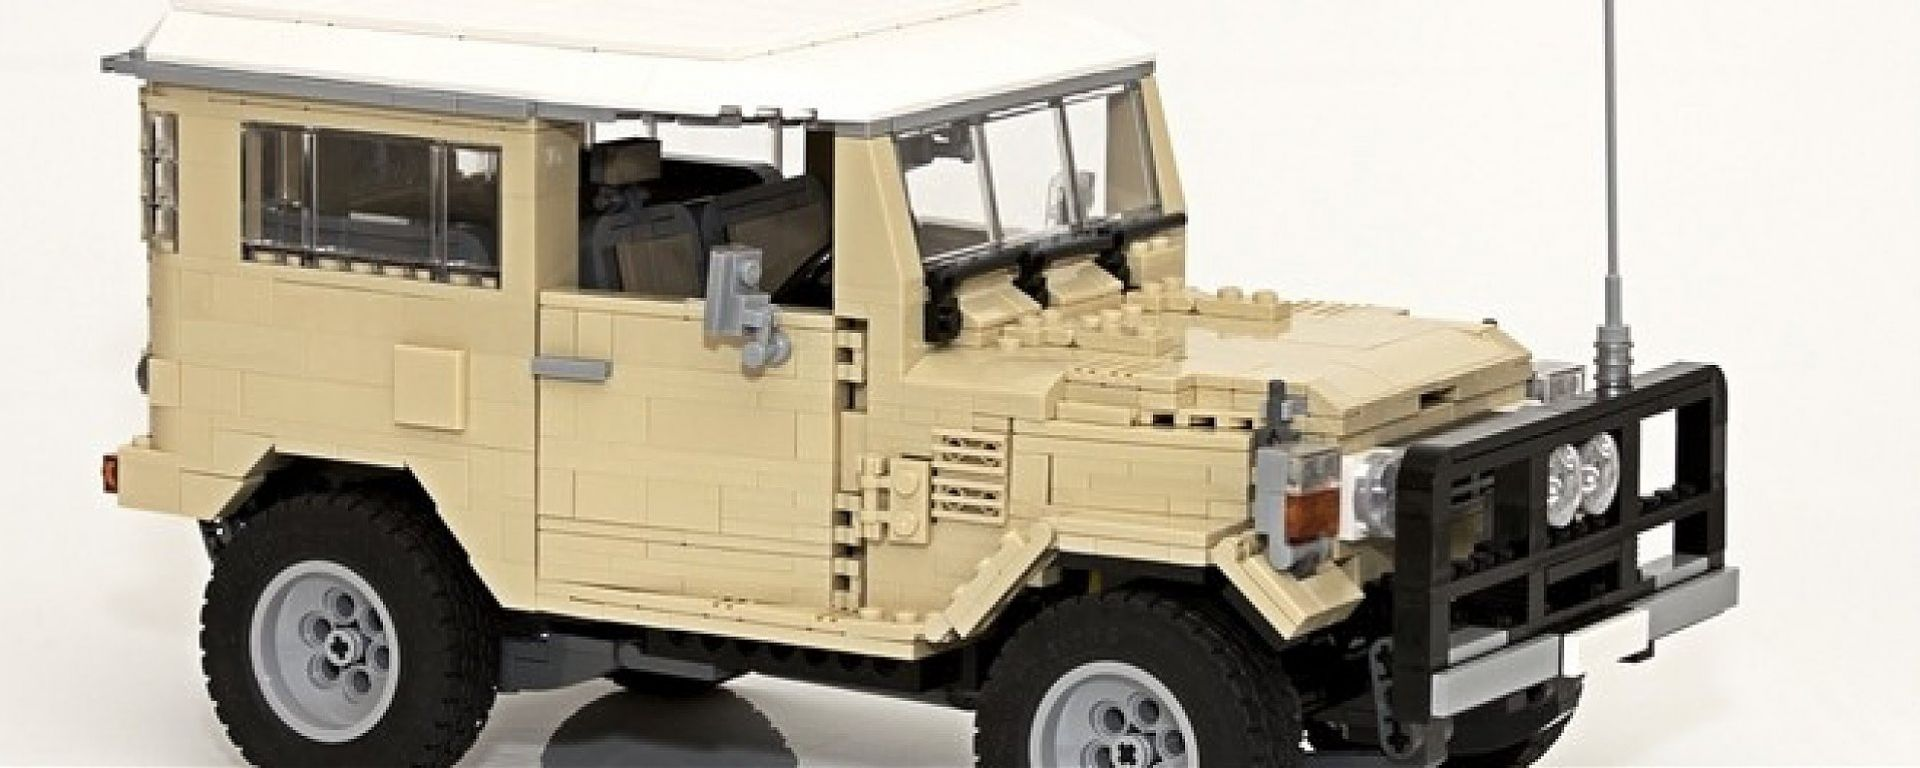 Lego Toyota Land Cruiser 40 Series